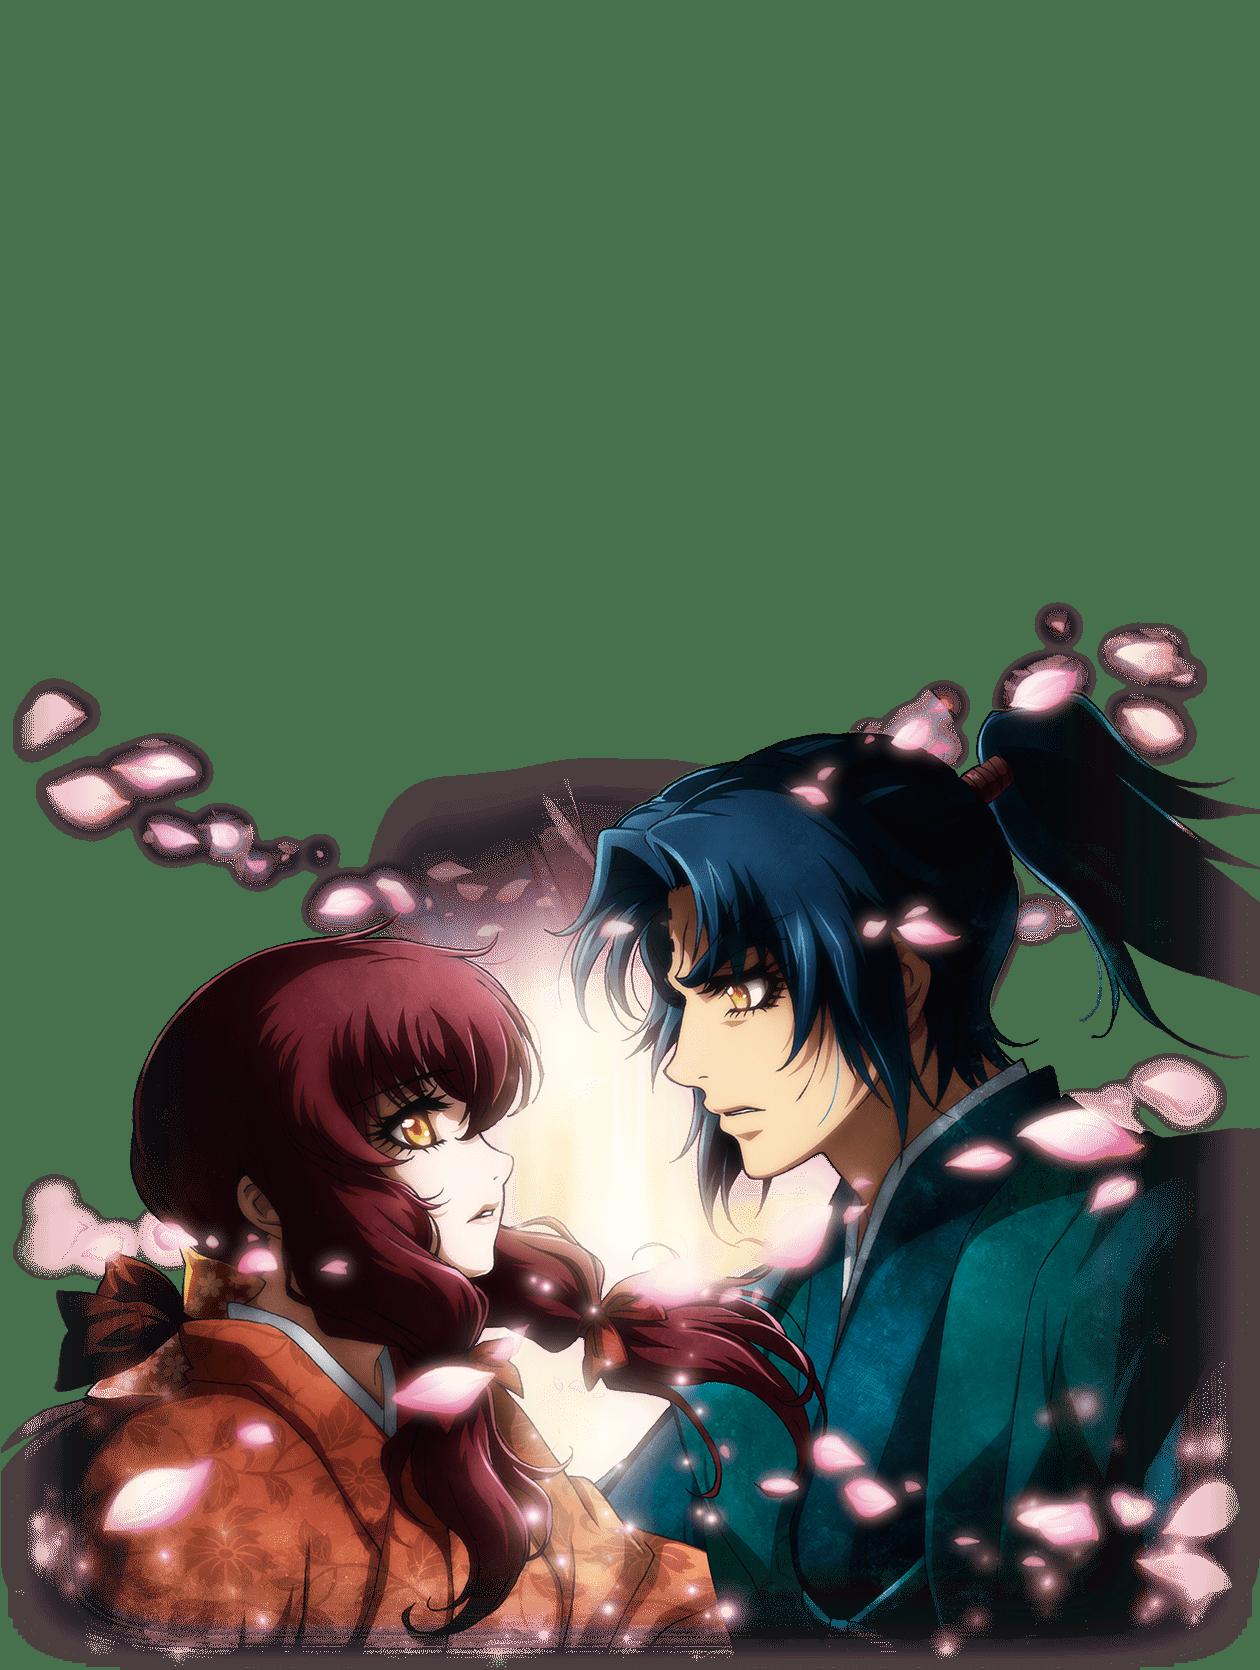 TVアニメ「バジリスク ~桜花忍法帖~」公式サイト